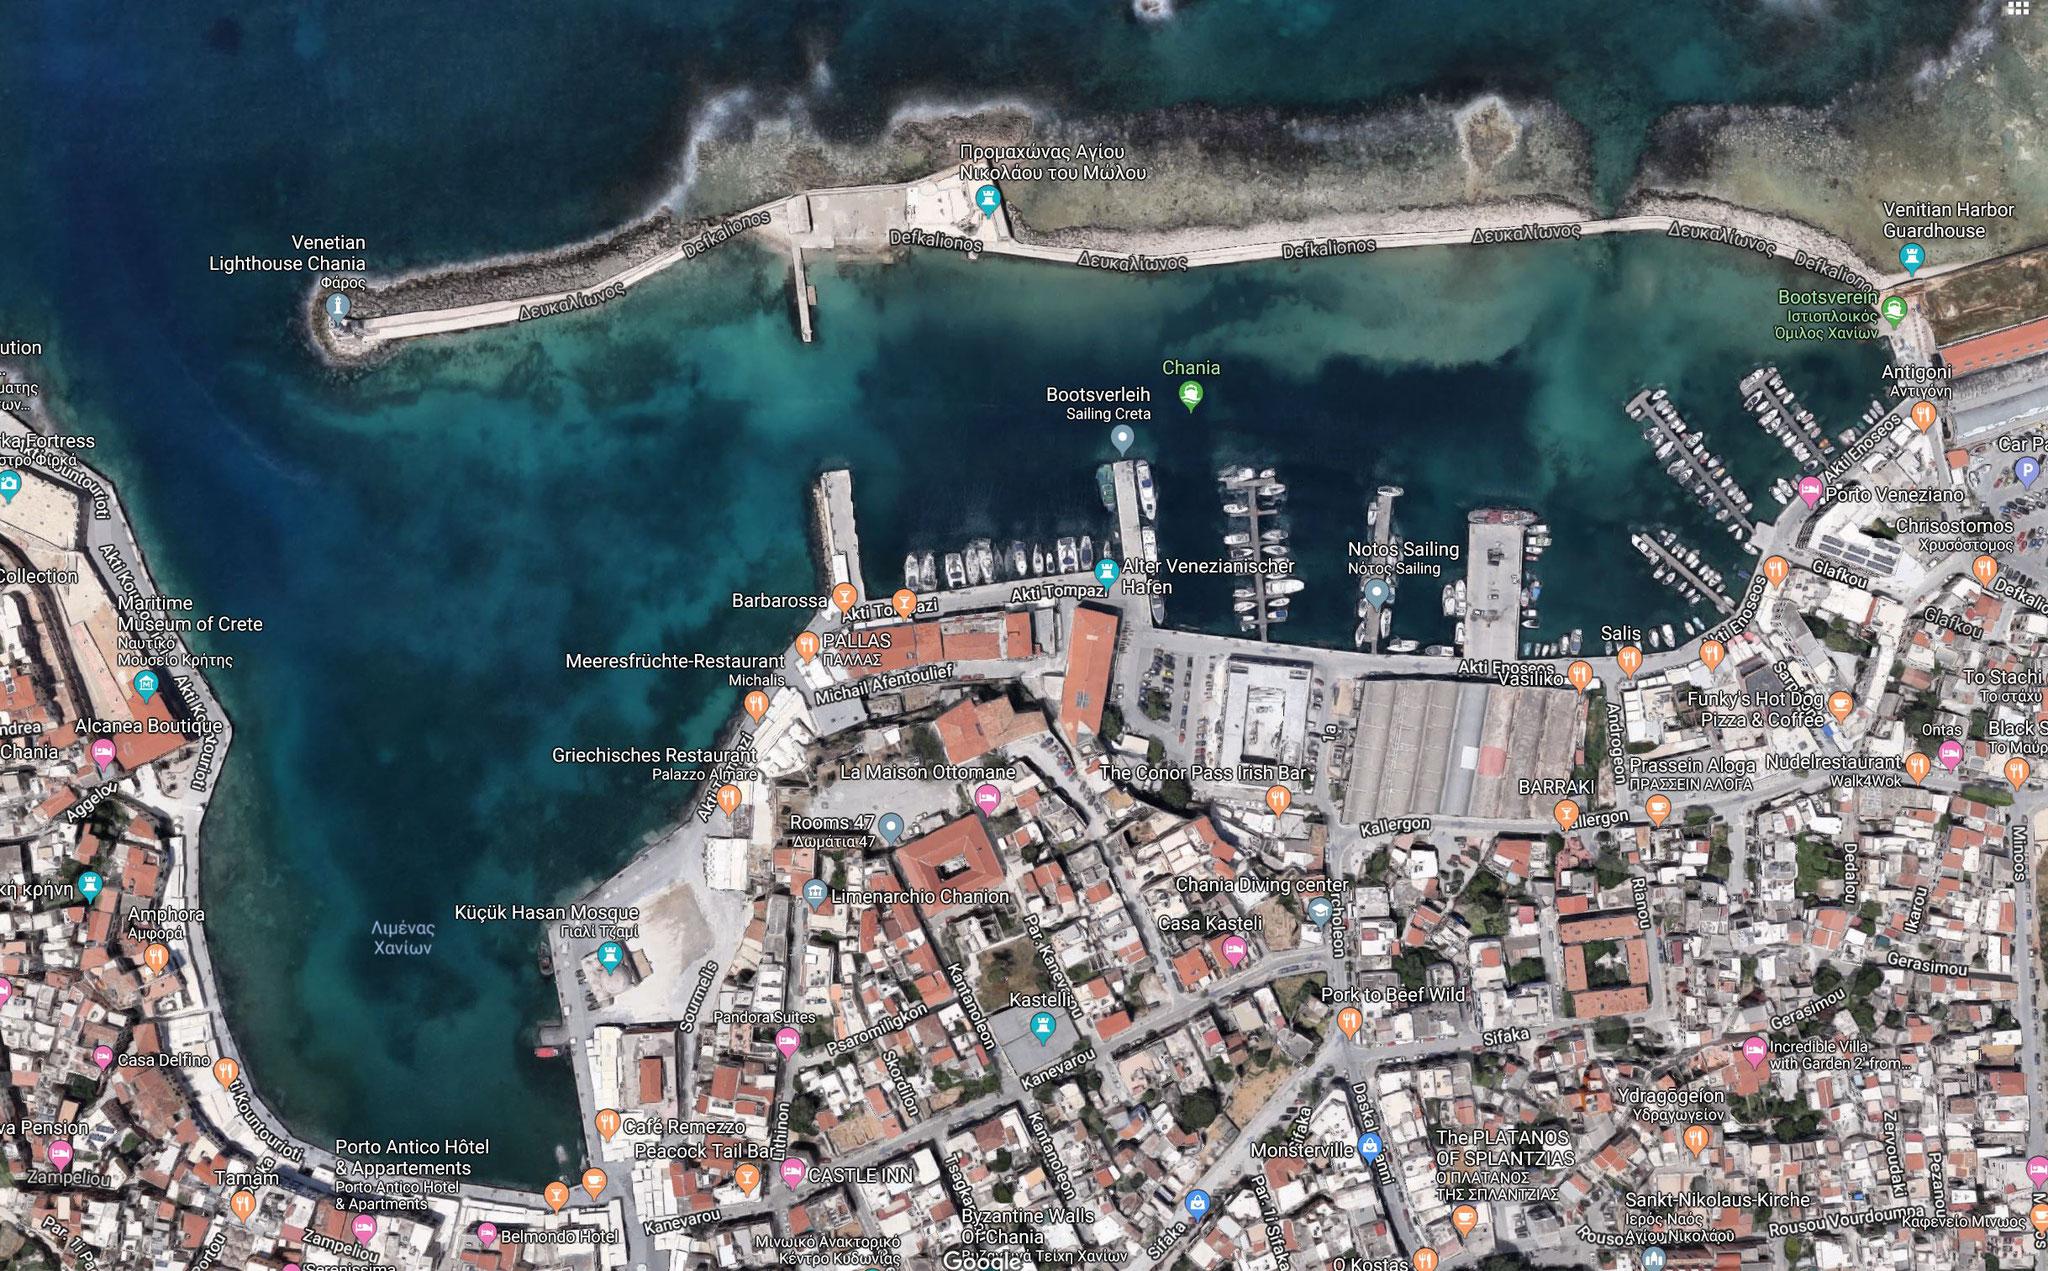 Stadt Chania auf Kreta - Griechenland, Katamaran Lagoon 42